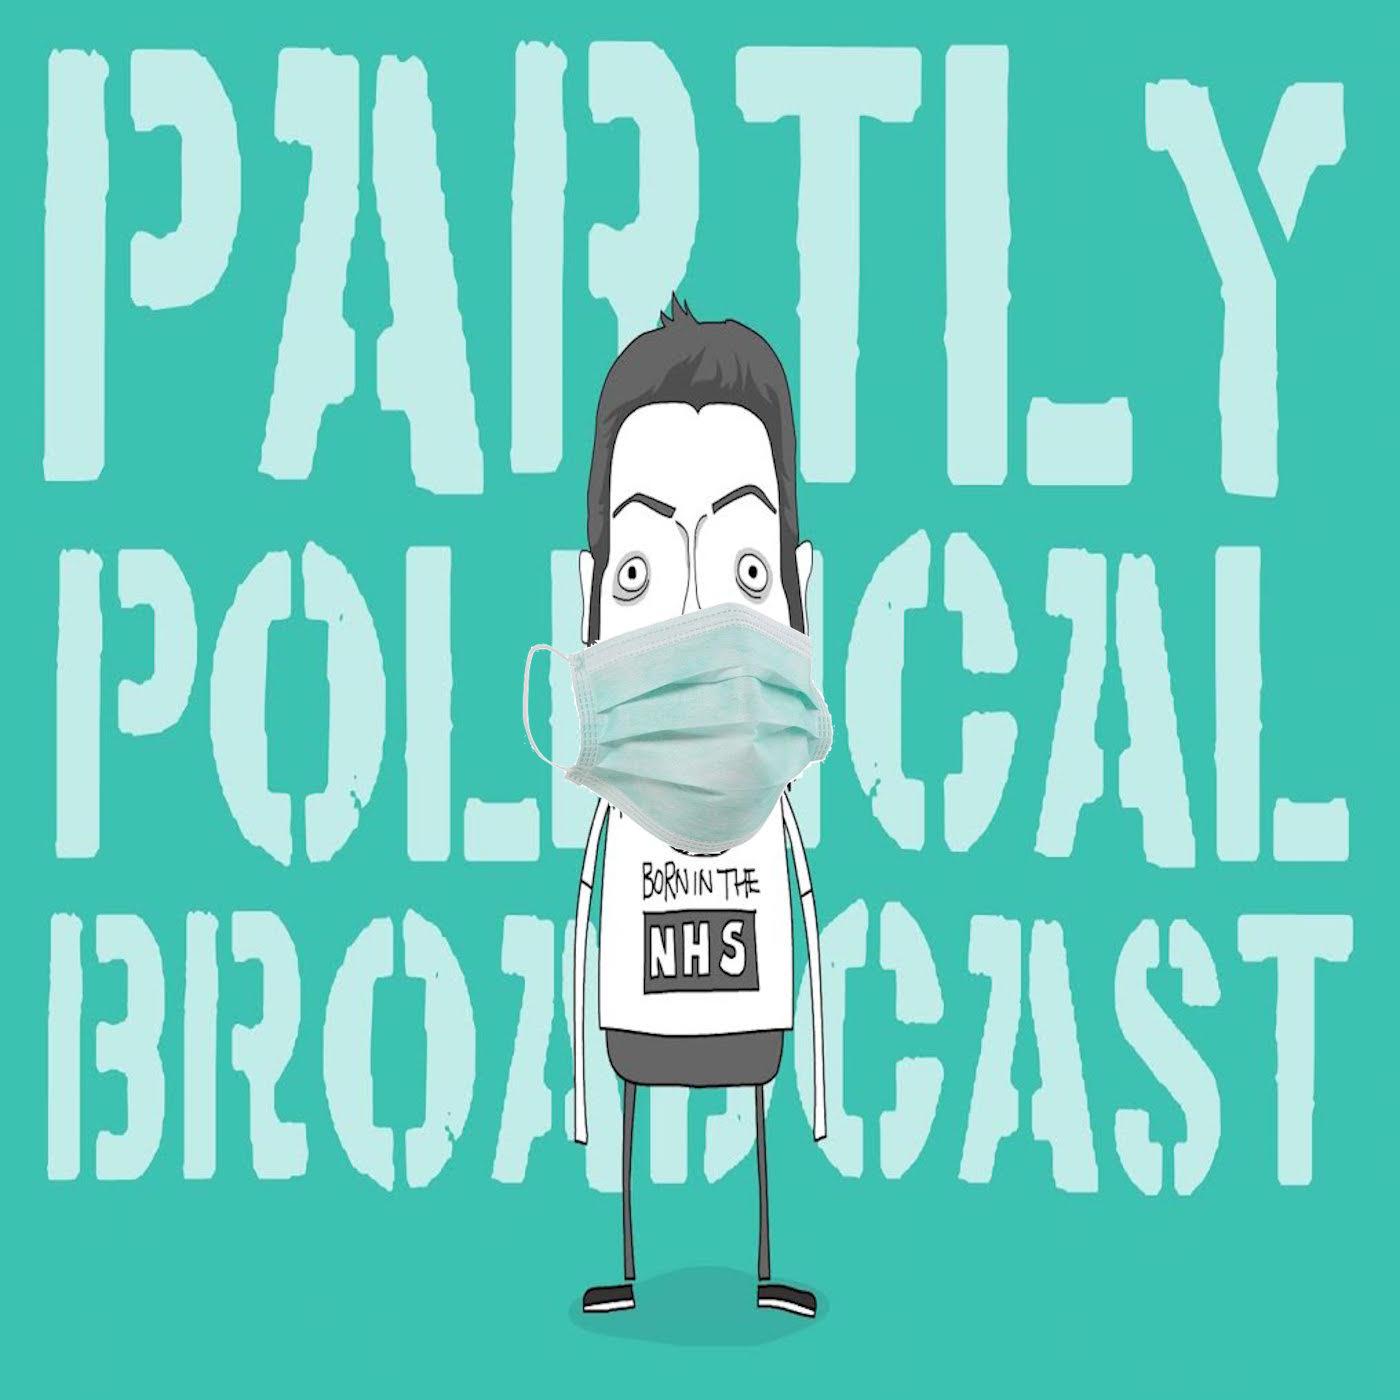 Partly Political Broadcast returns!